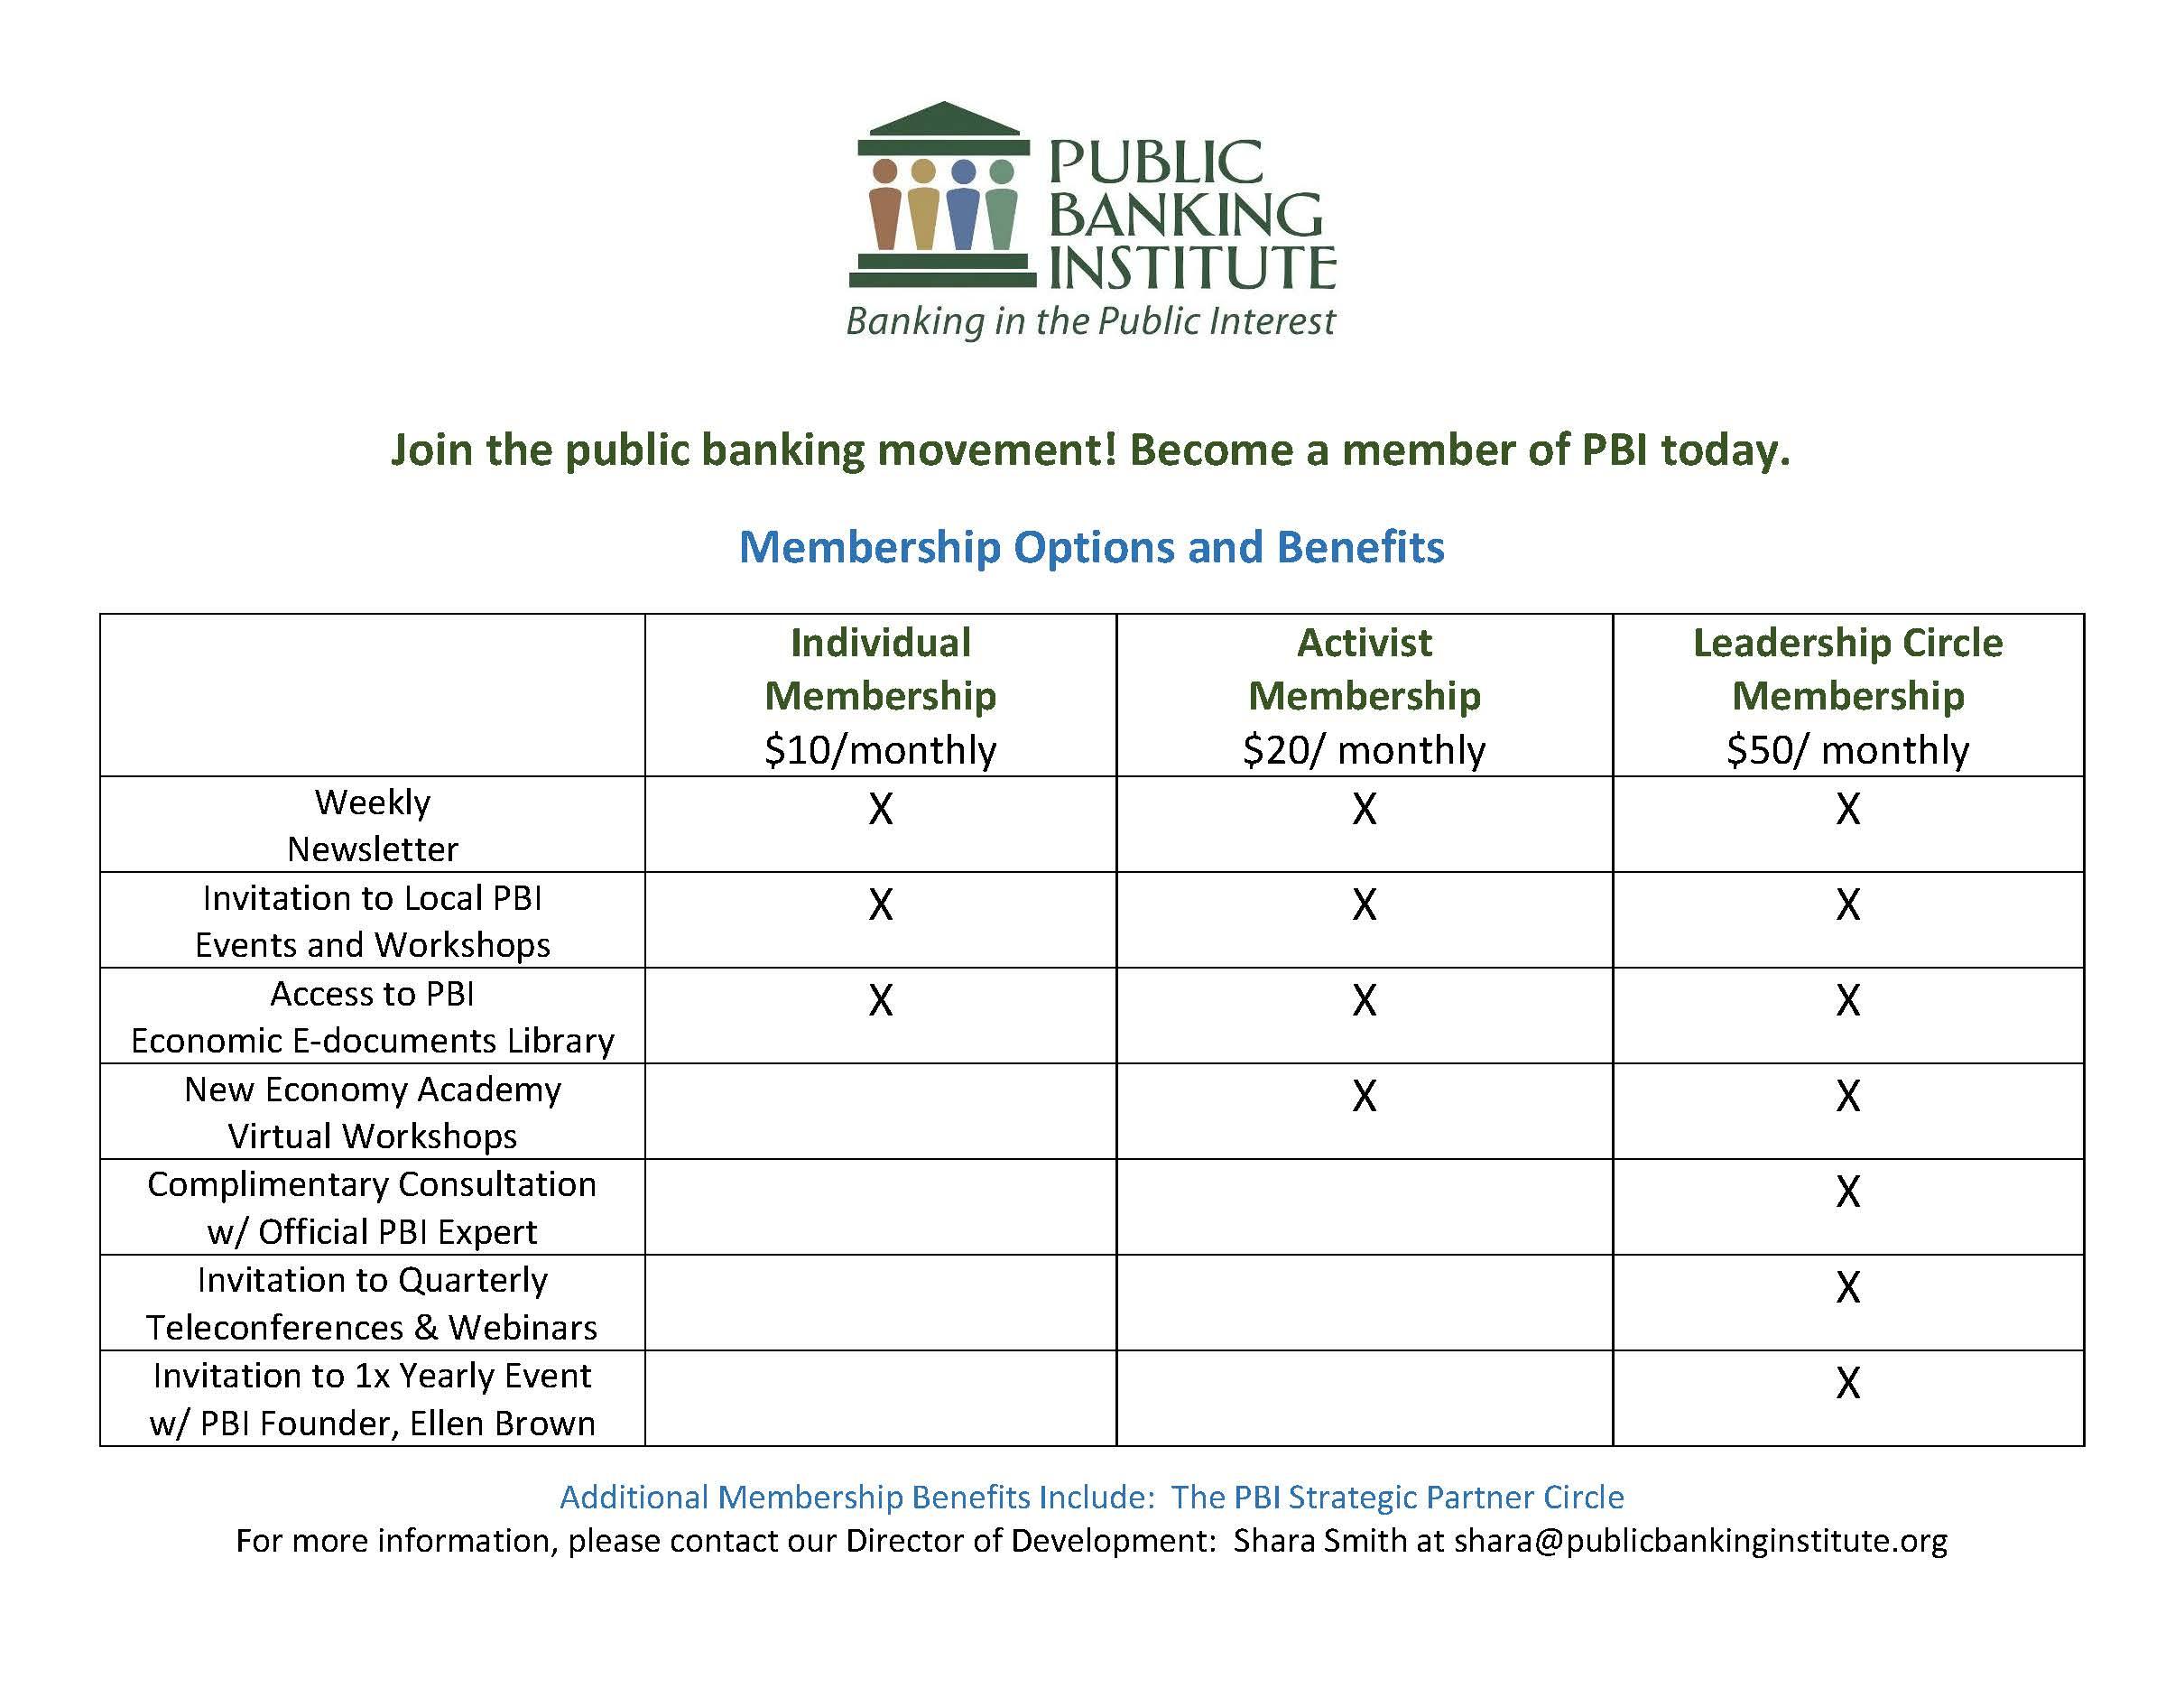 Membership_Levels___Benefits_1pgr.jpg